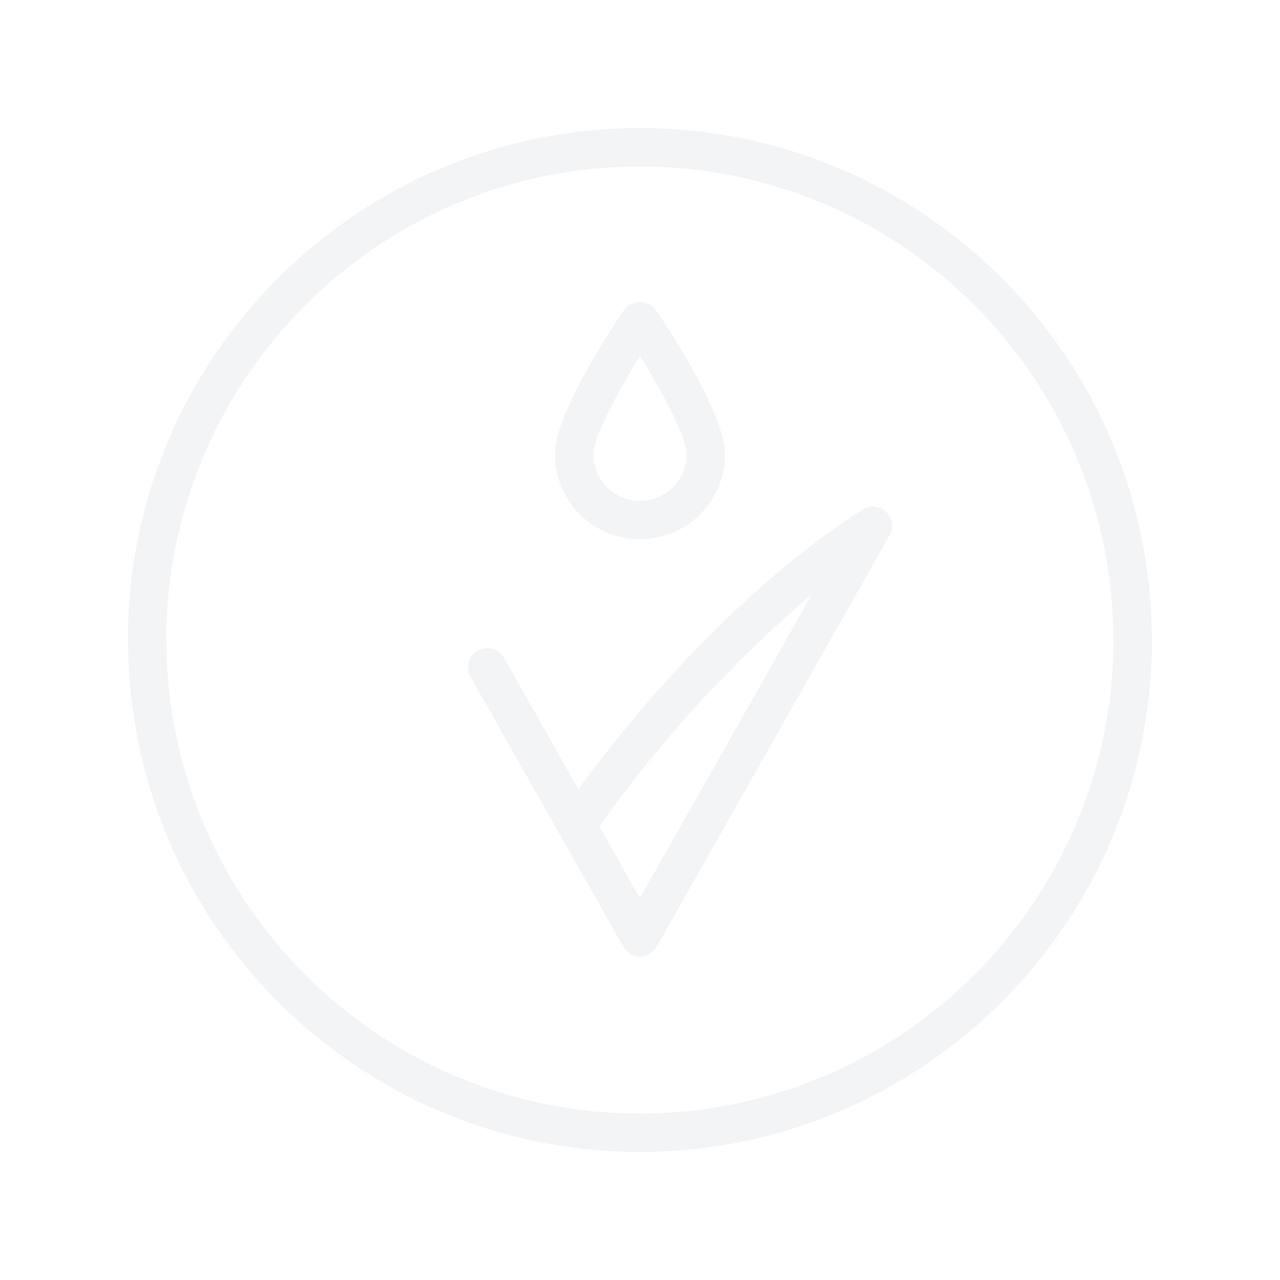 Dr. Hauschka Translucent Bronzing Tint 30ml